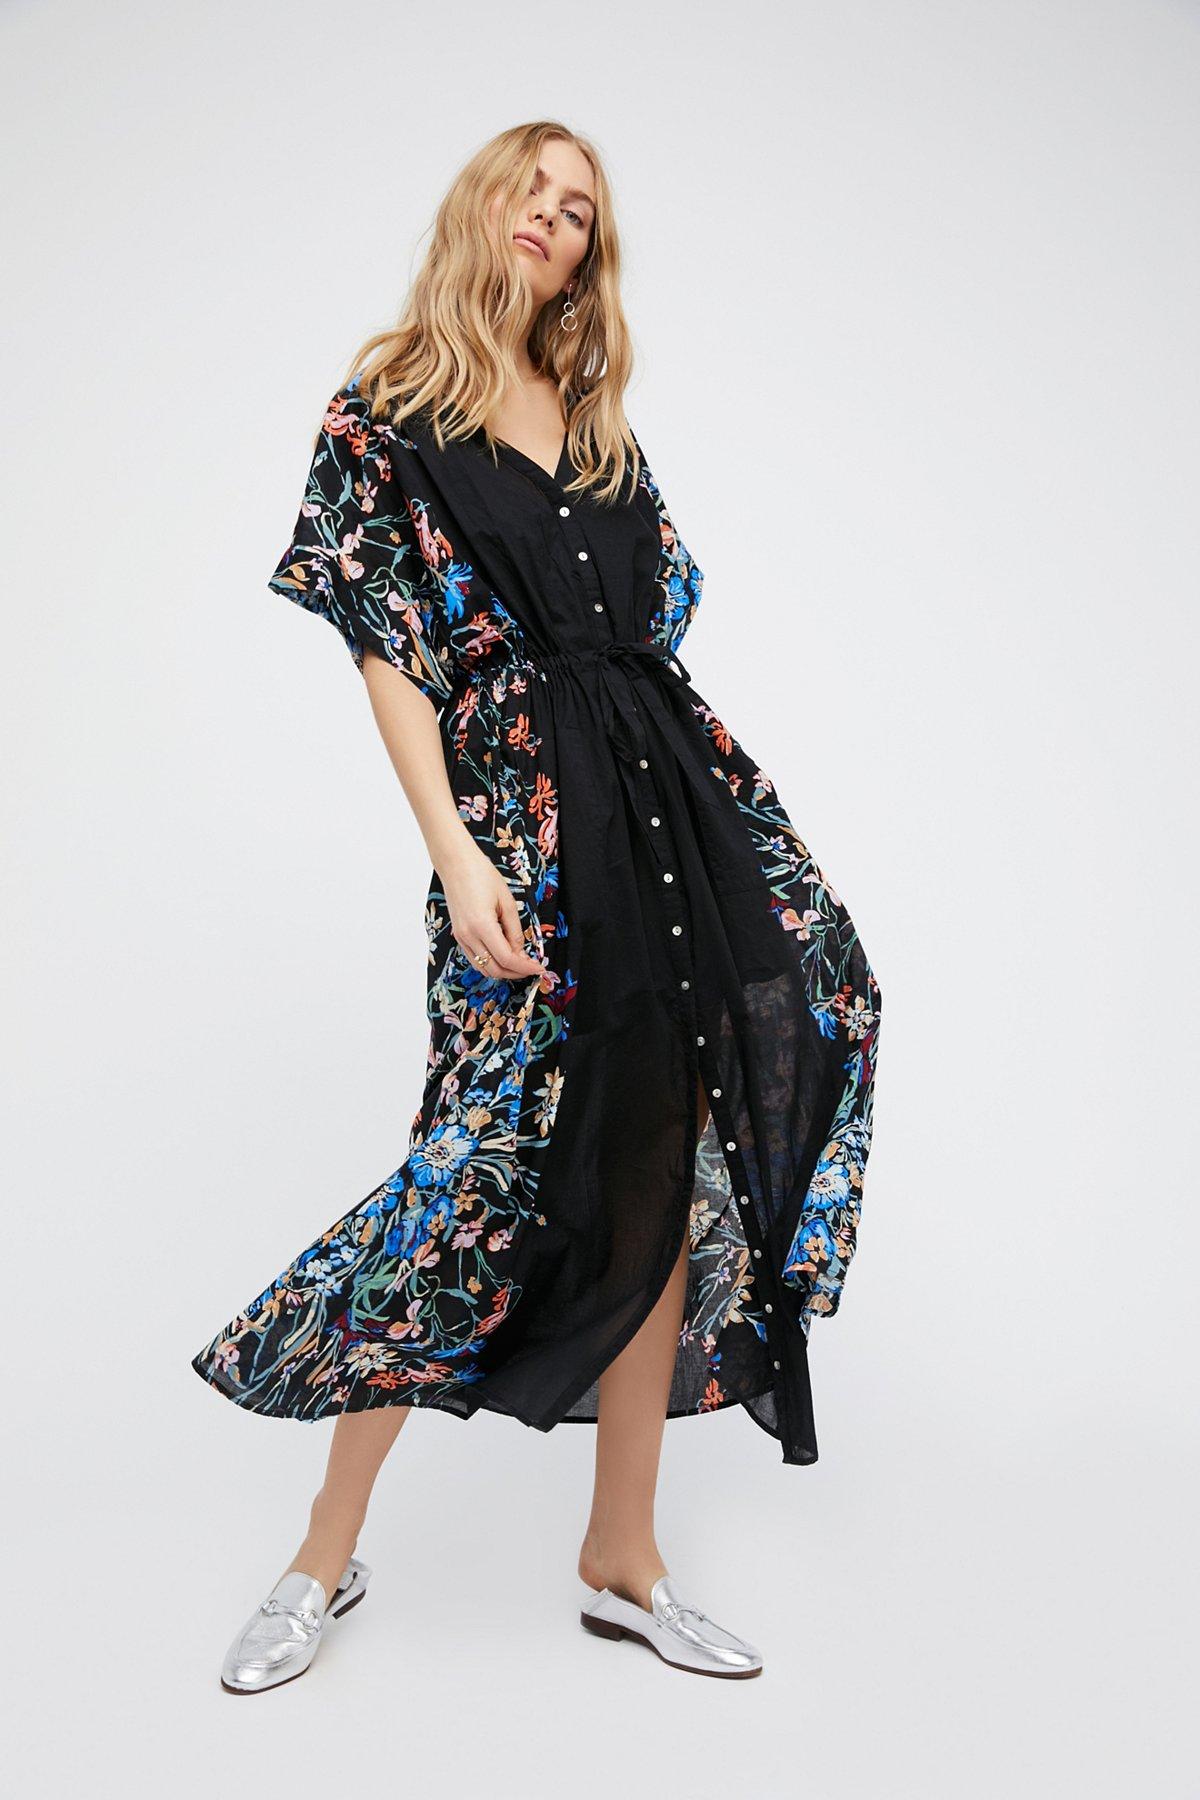 Avant Garden超长连衣裙